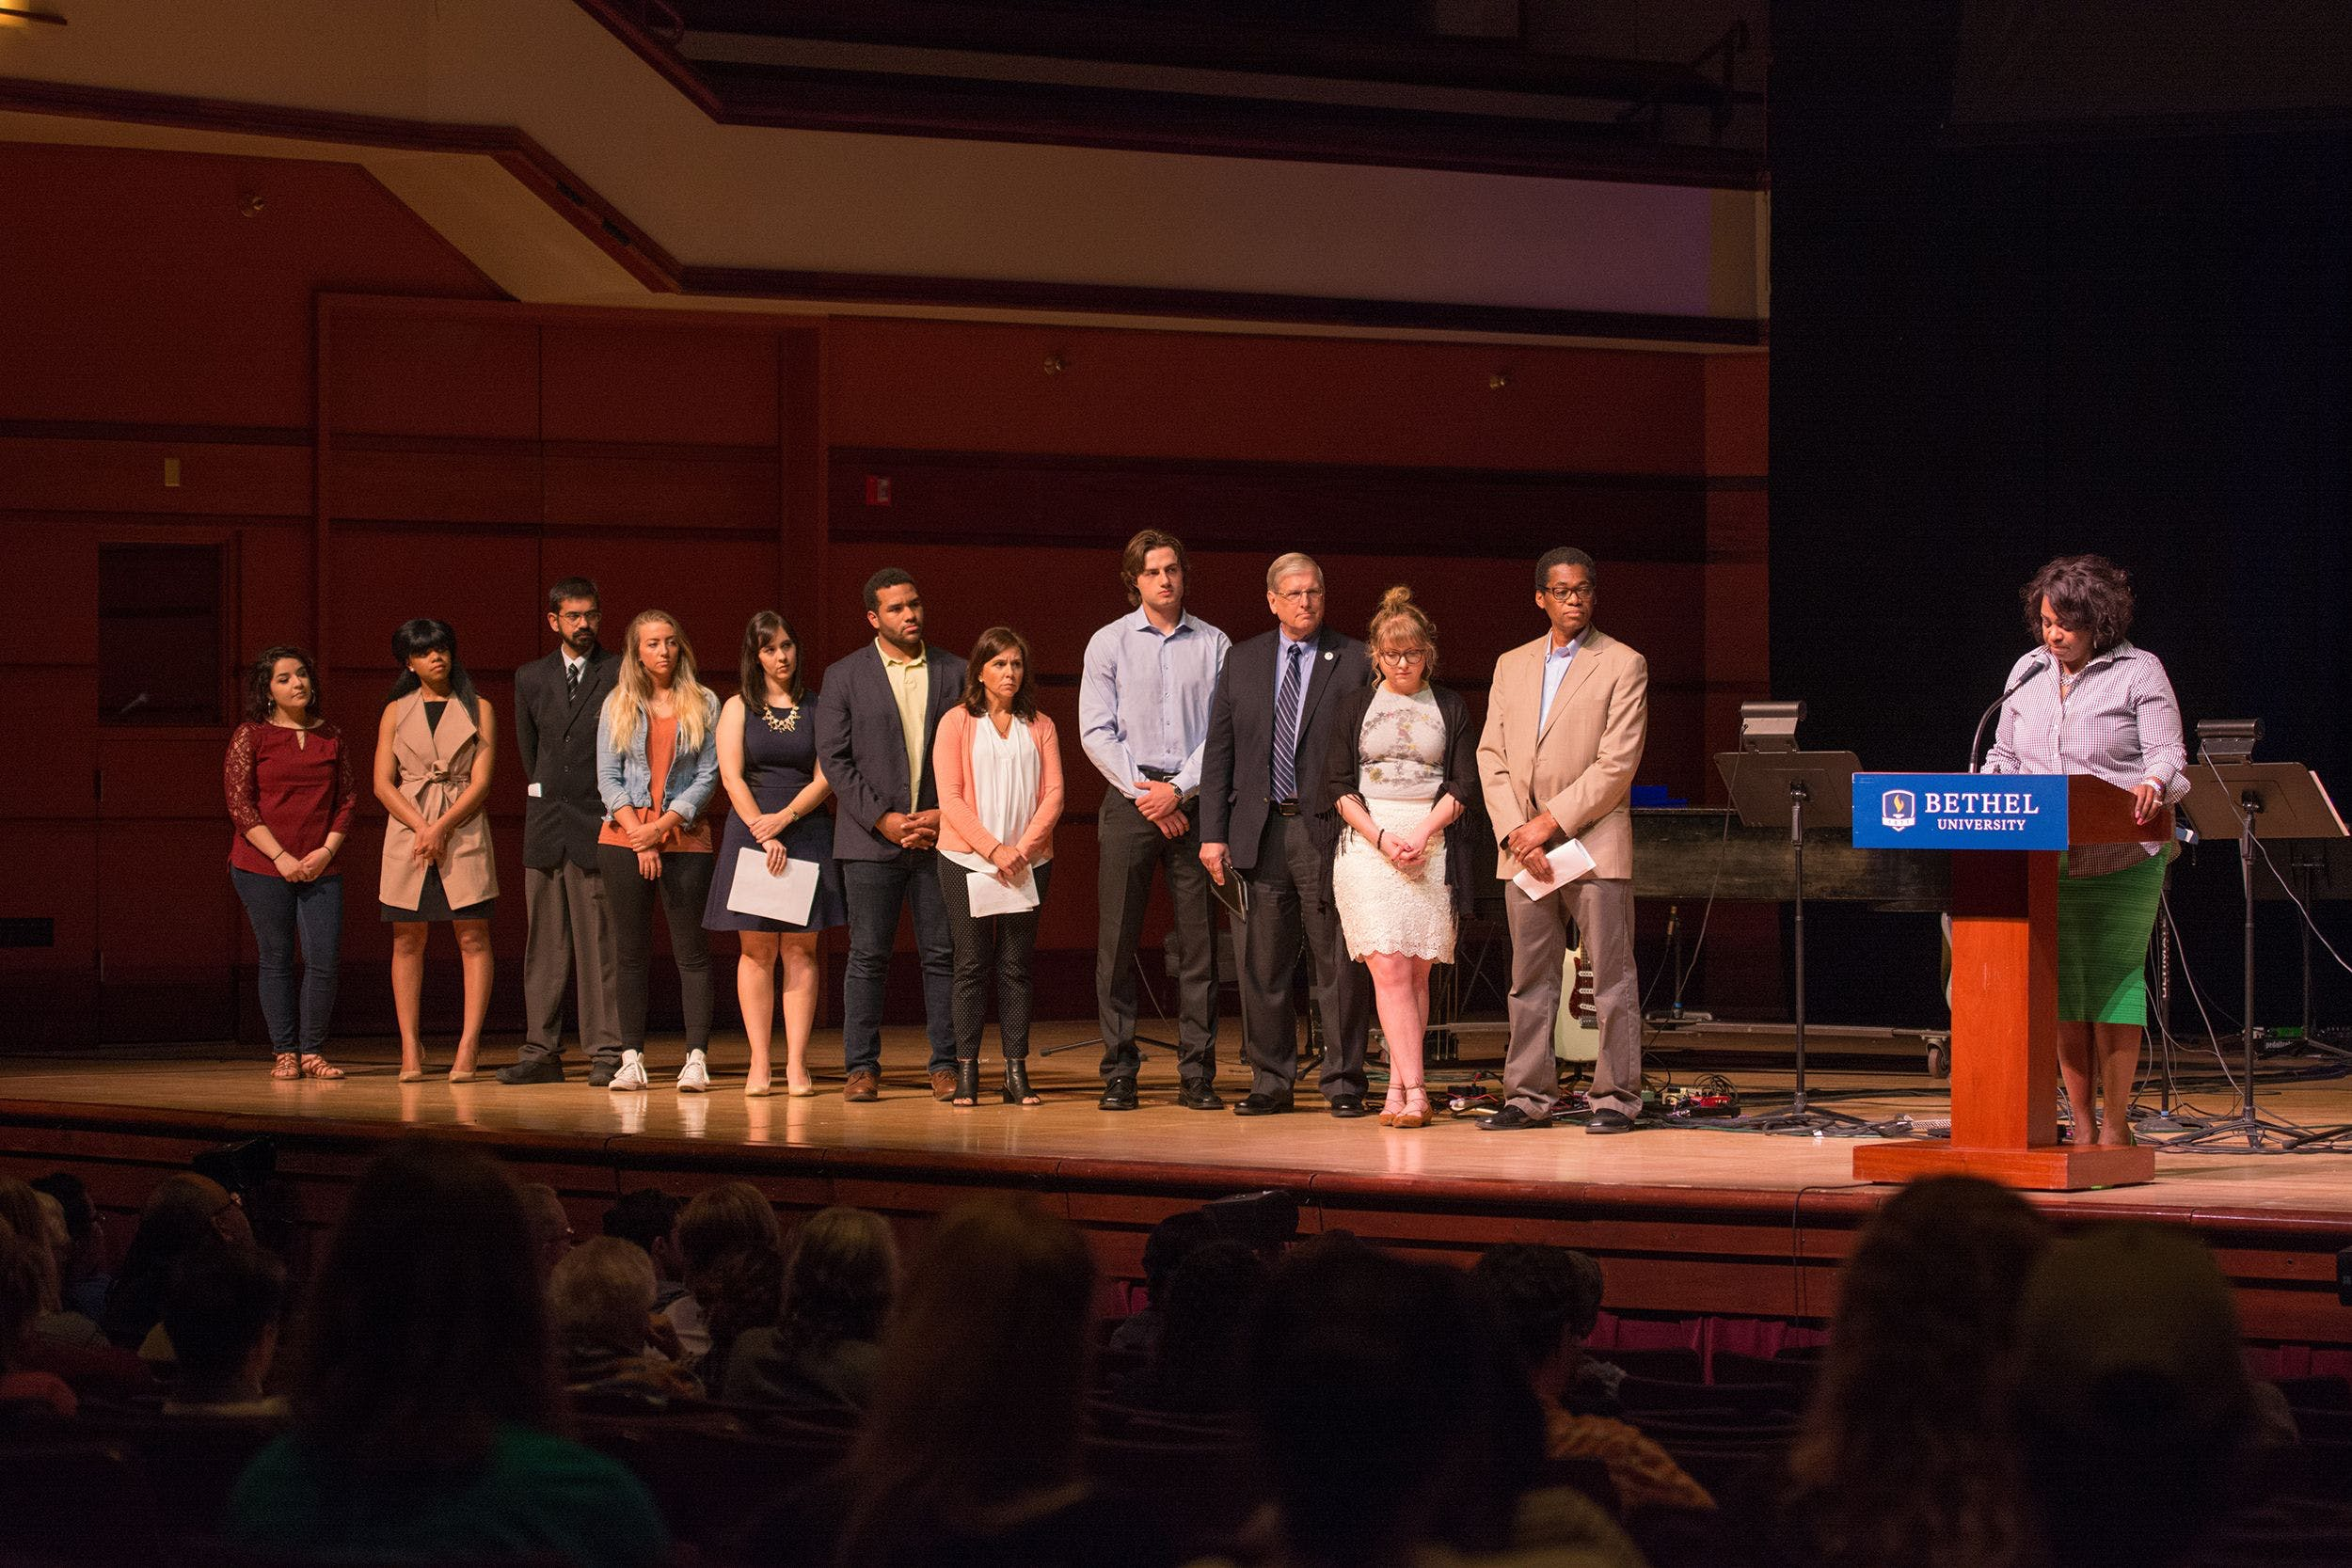 Servant Leadership Award Winners Honored in Chapel